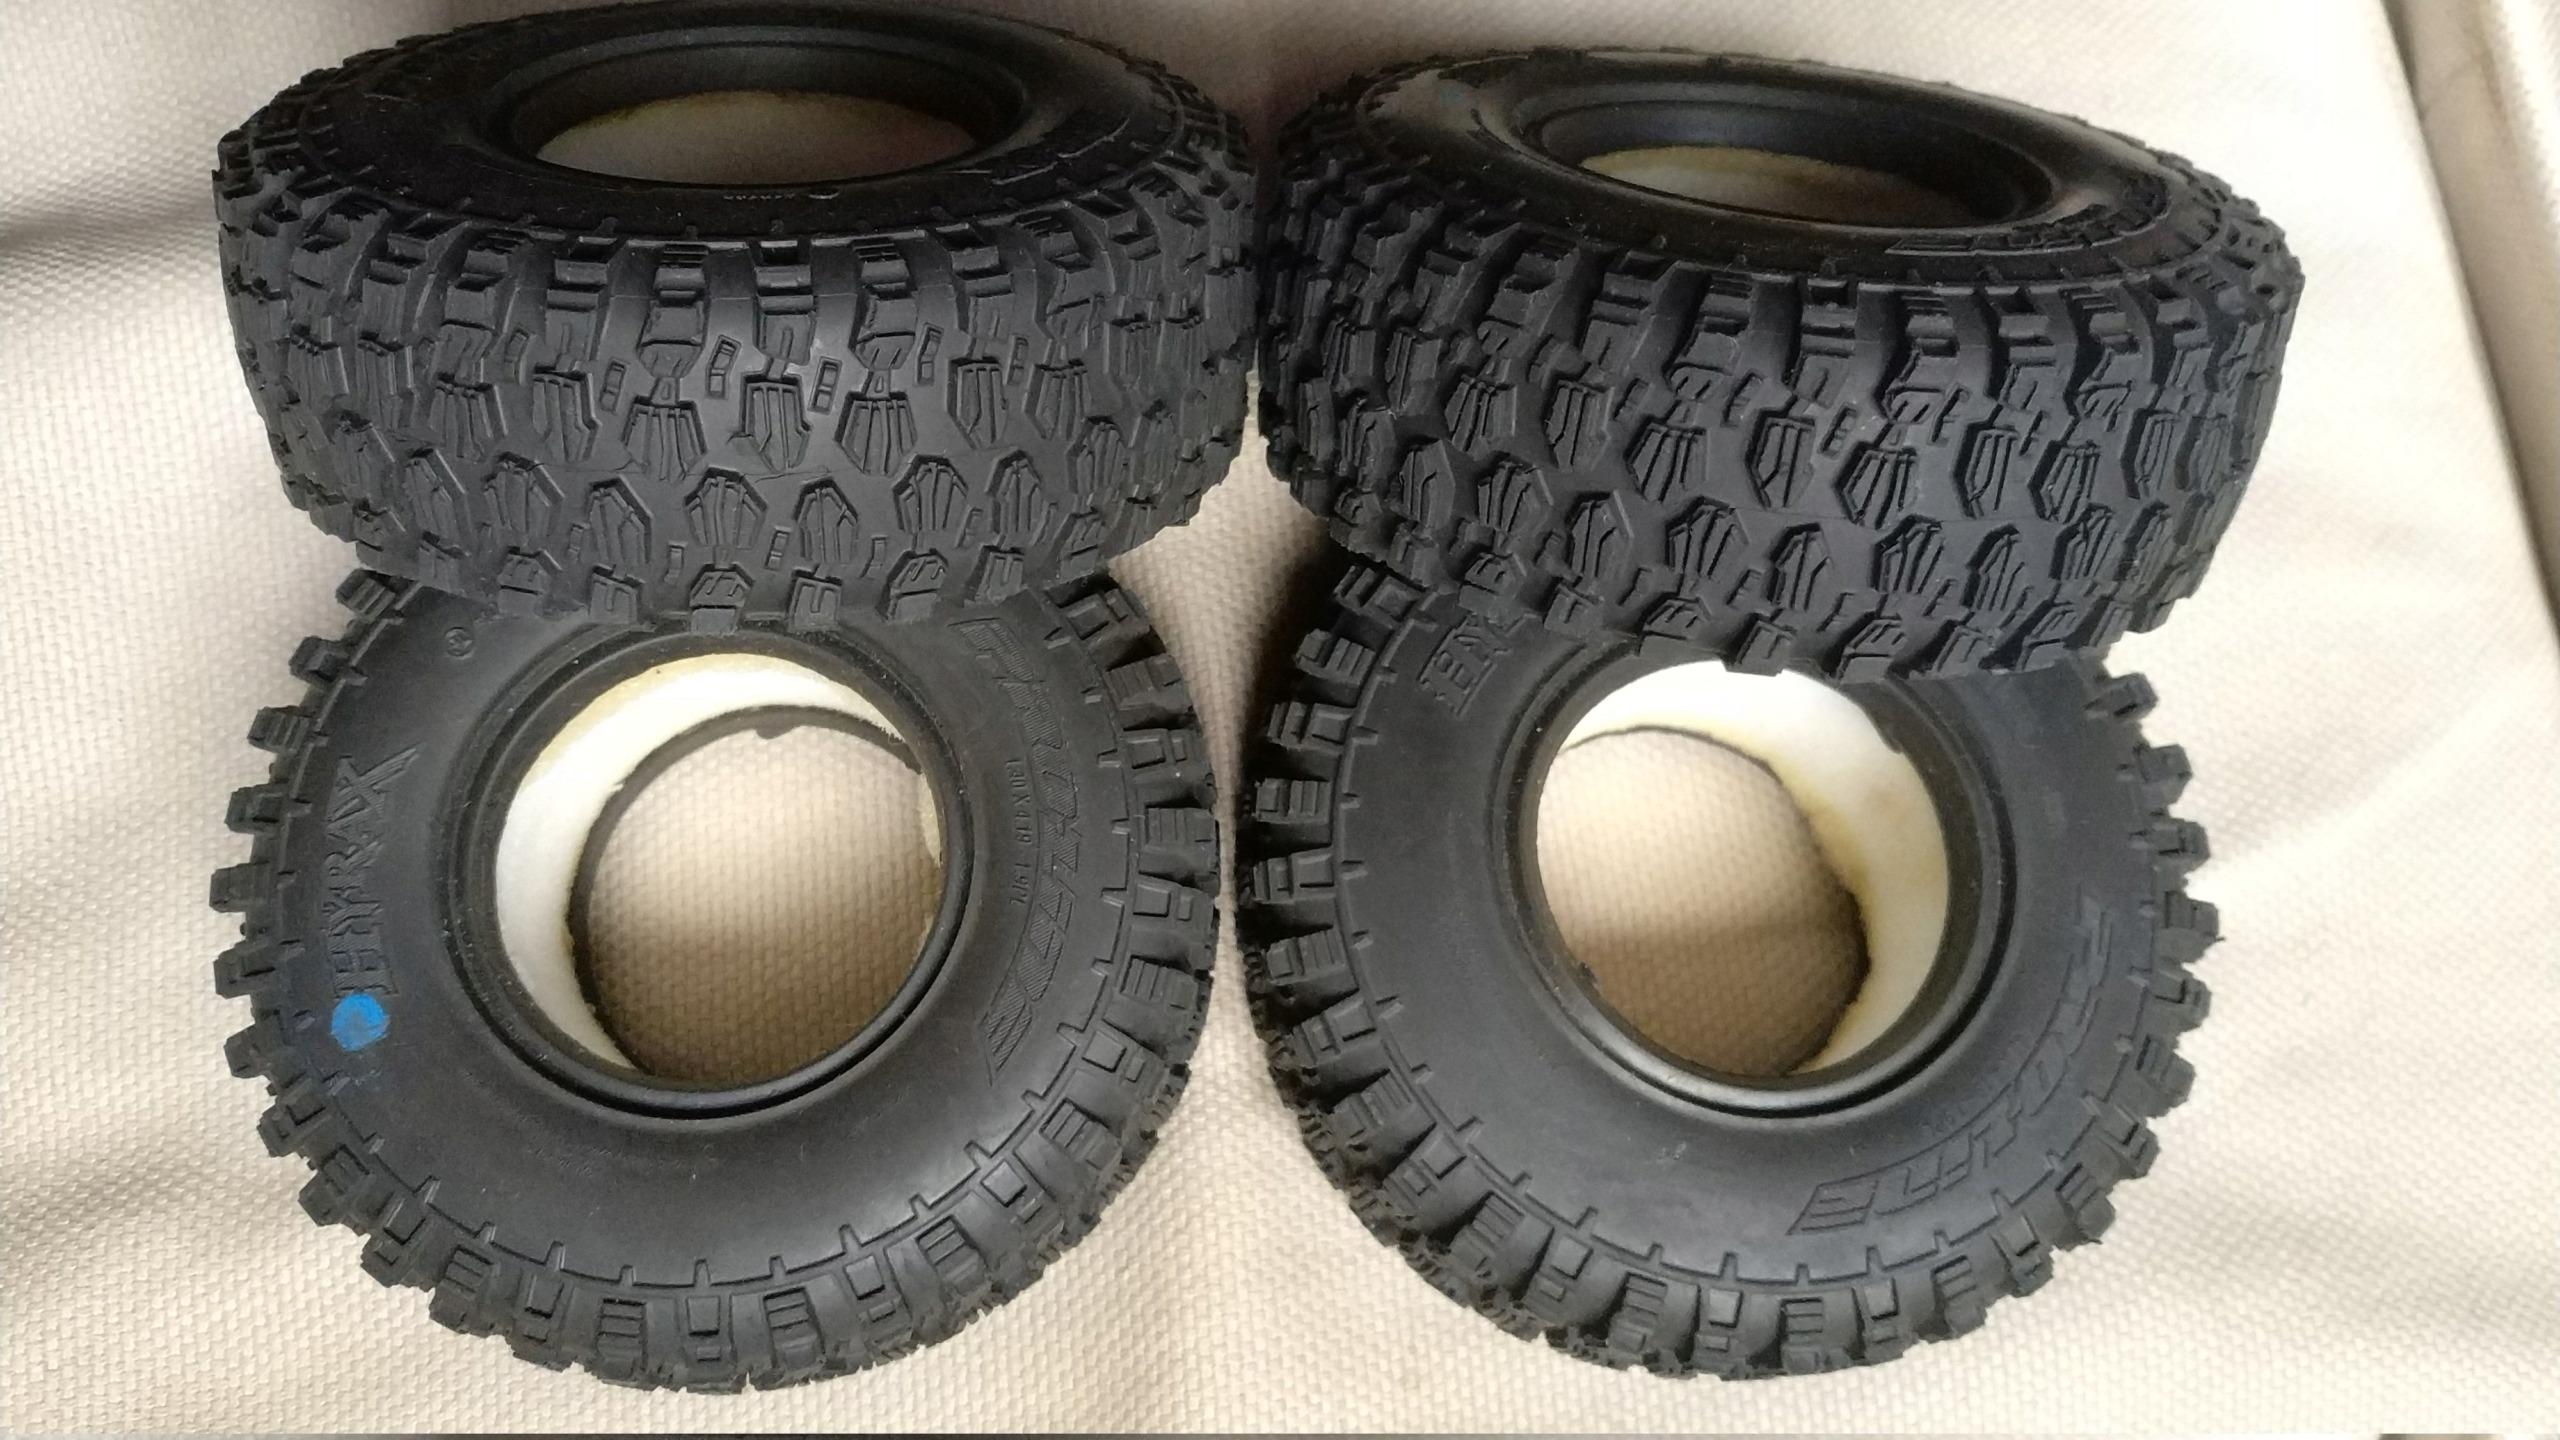 [VENDU] 4 pneus Proline Hyrax Predator 1.9 en 106mm.  Img_2697